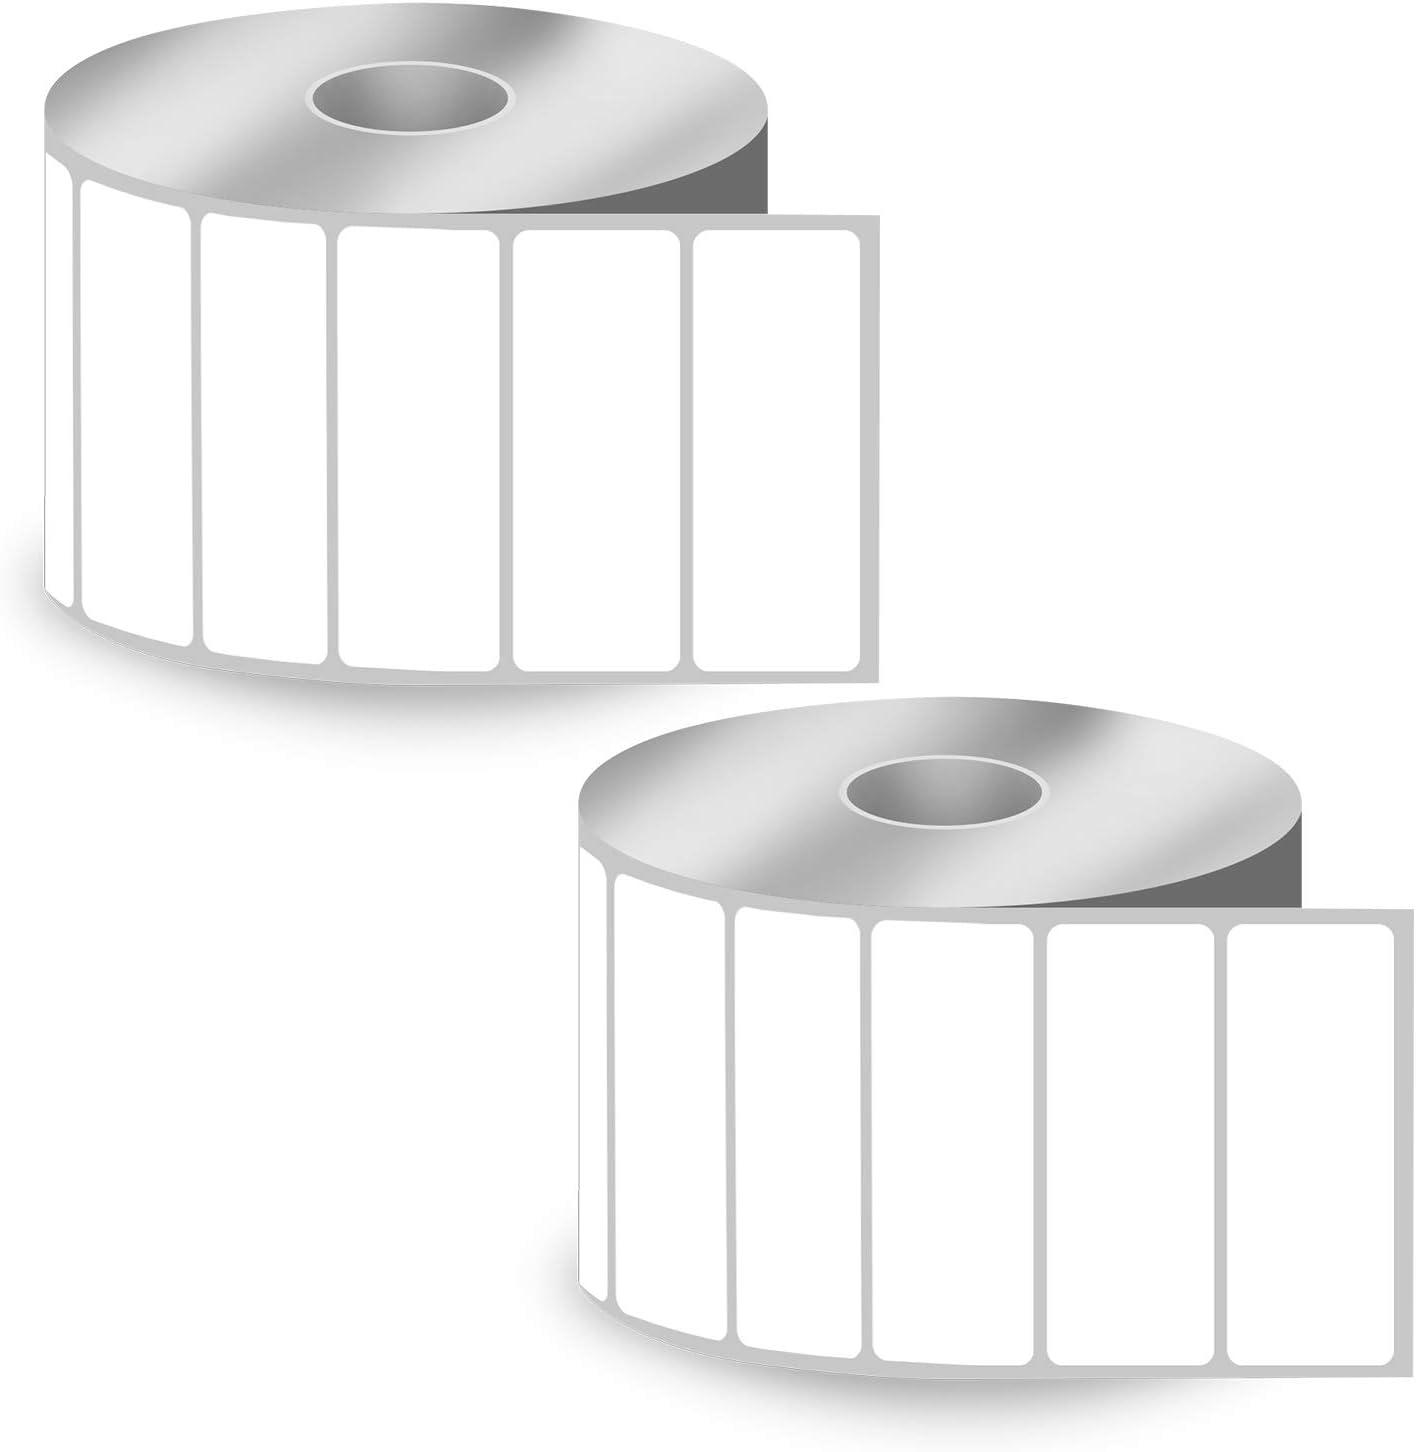 20 Label Rolls for Berkel 49x62 mm Blank Thermal Labels